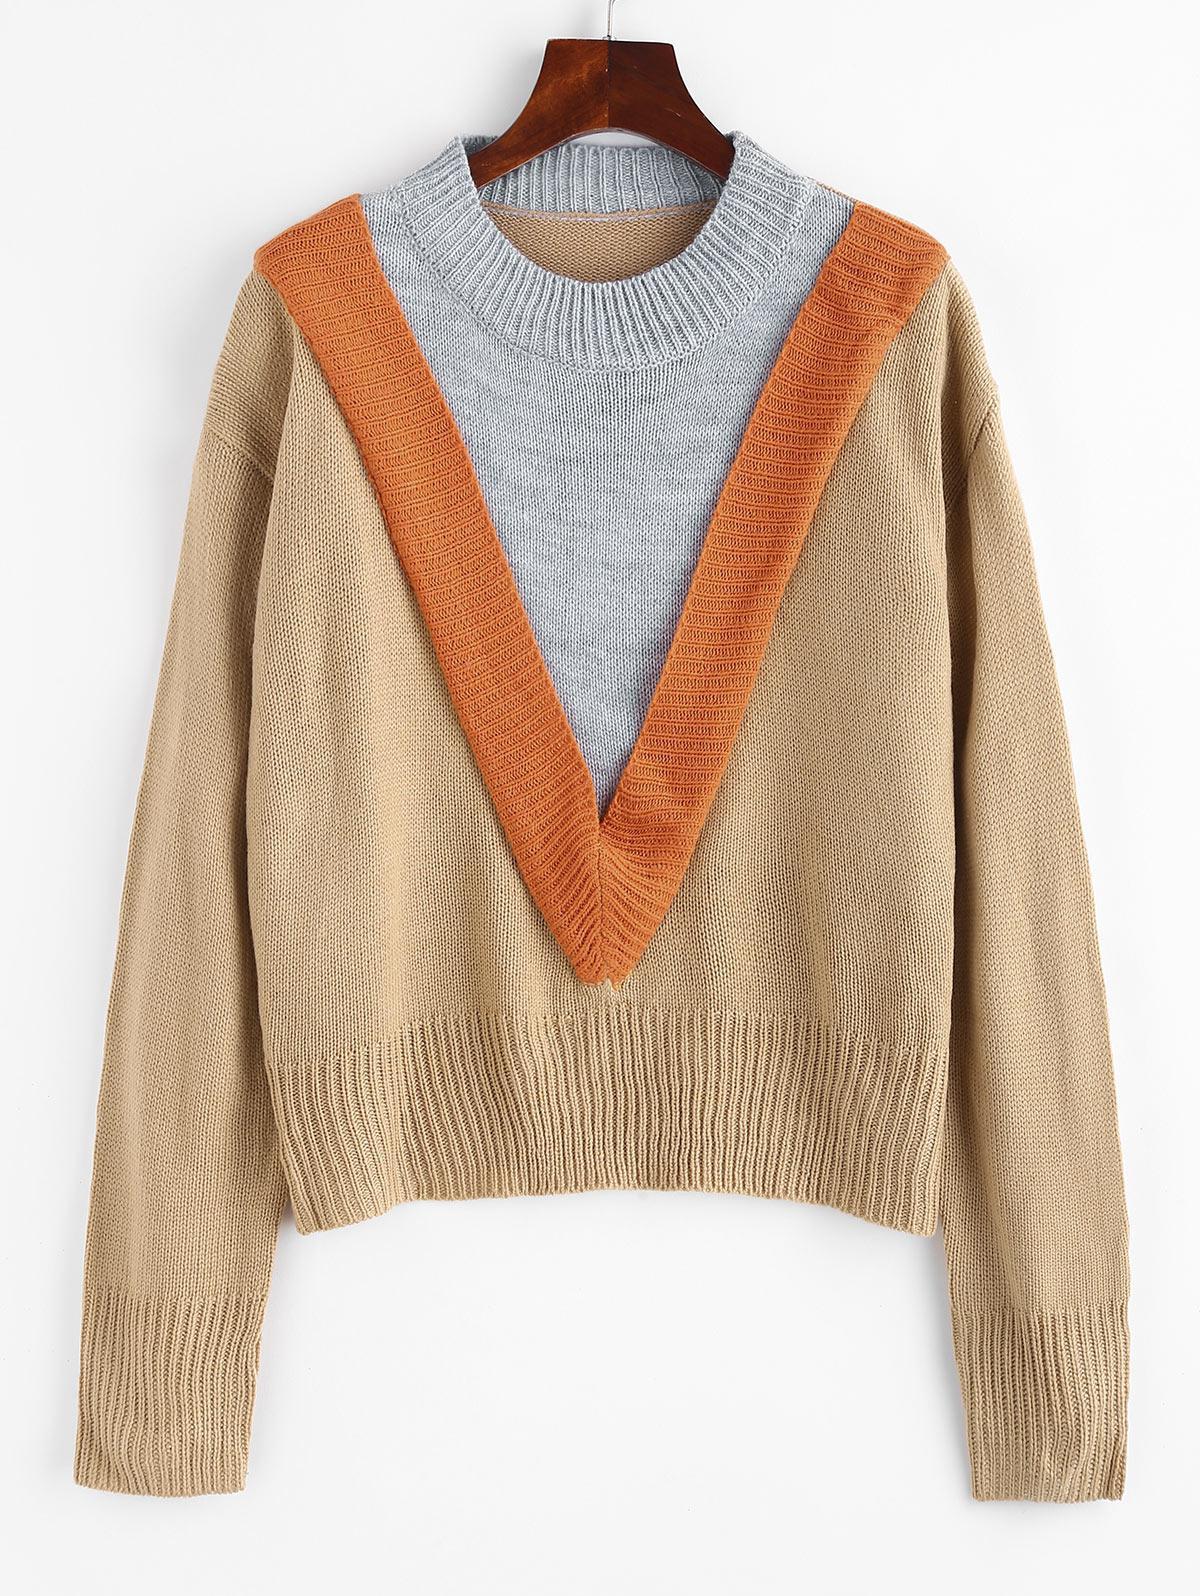 Zaful Crew Neck Colorblock Sweater